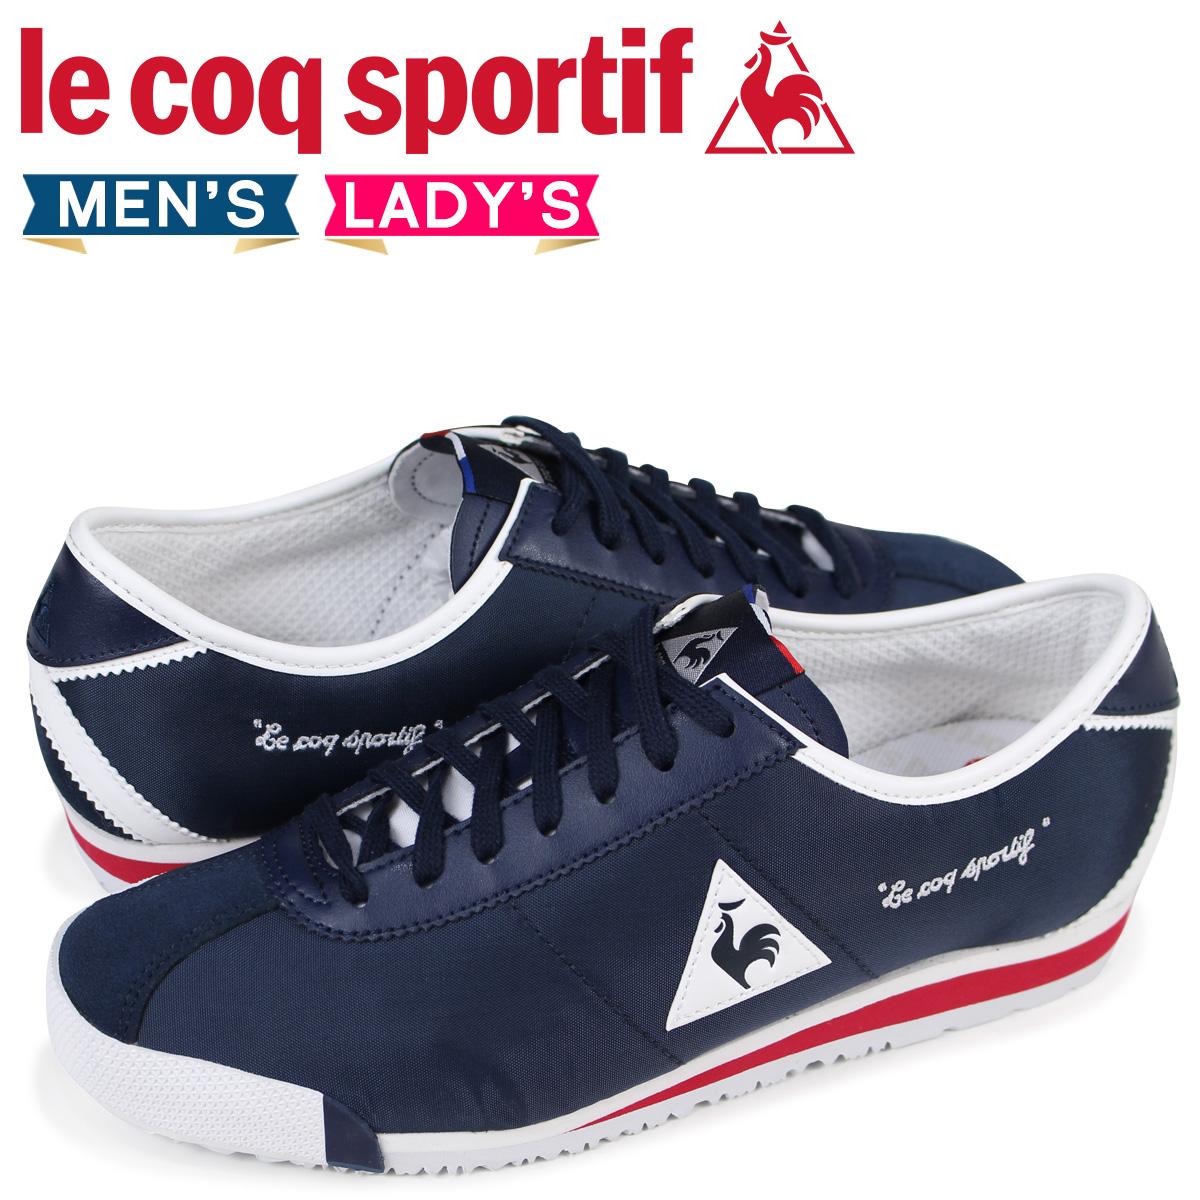 43ea75777920 le coq sportif Le Coq Sportif men gap Dis sneakers Montpellier OG NY  MONTPELLIER navy QL1LJC07NV  2 10 Shinnyu load